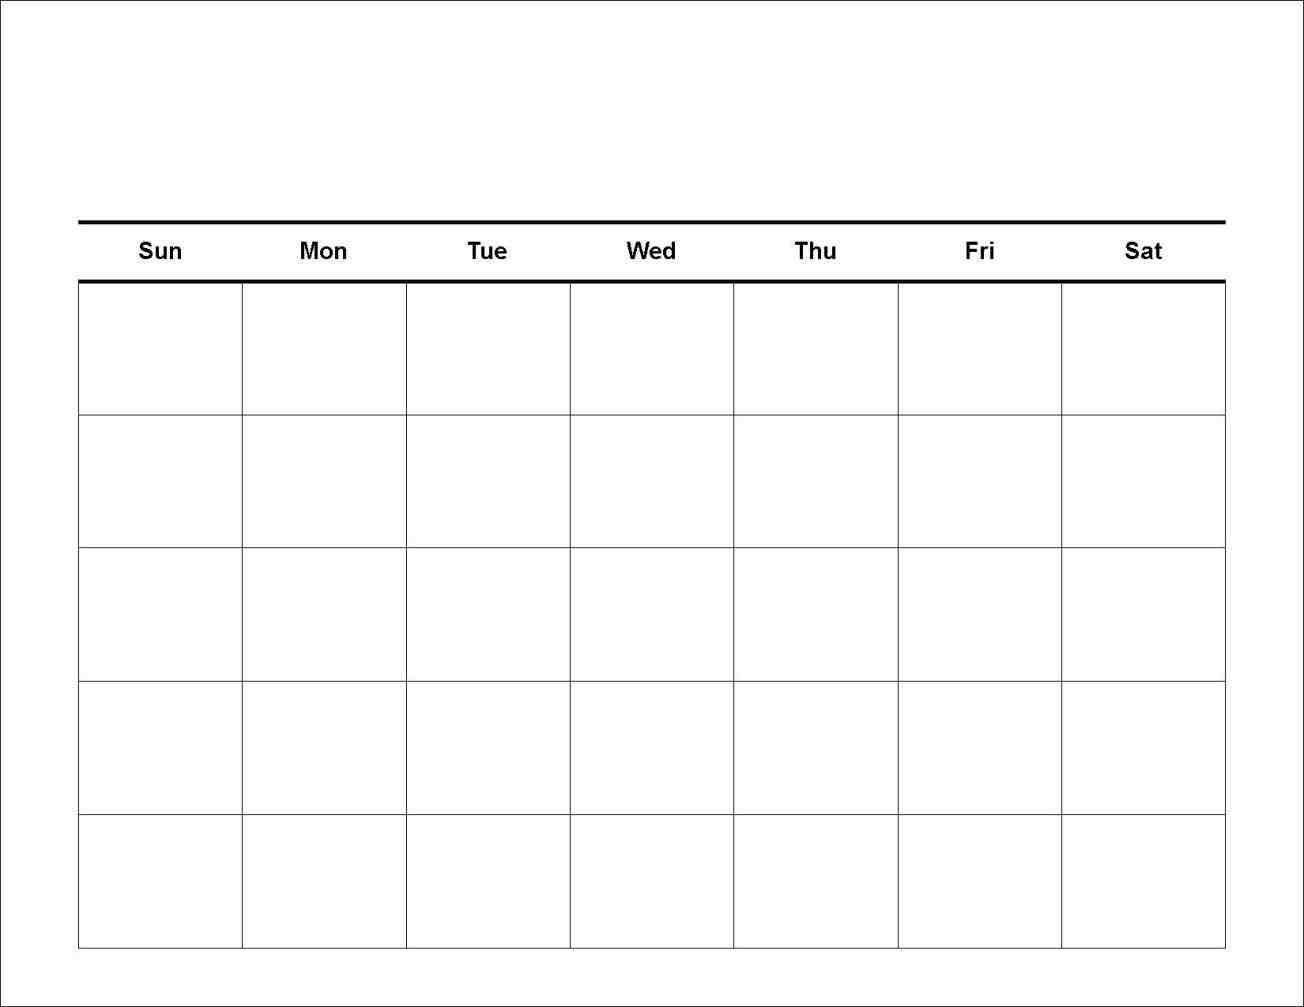 7 Day Calendar Template | Printable Calendar Grid, Weekly Blank 7 Day Calendar Template